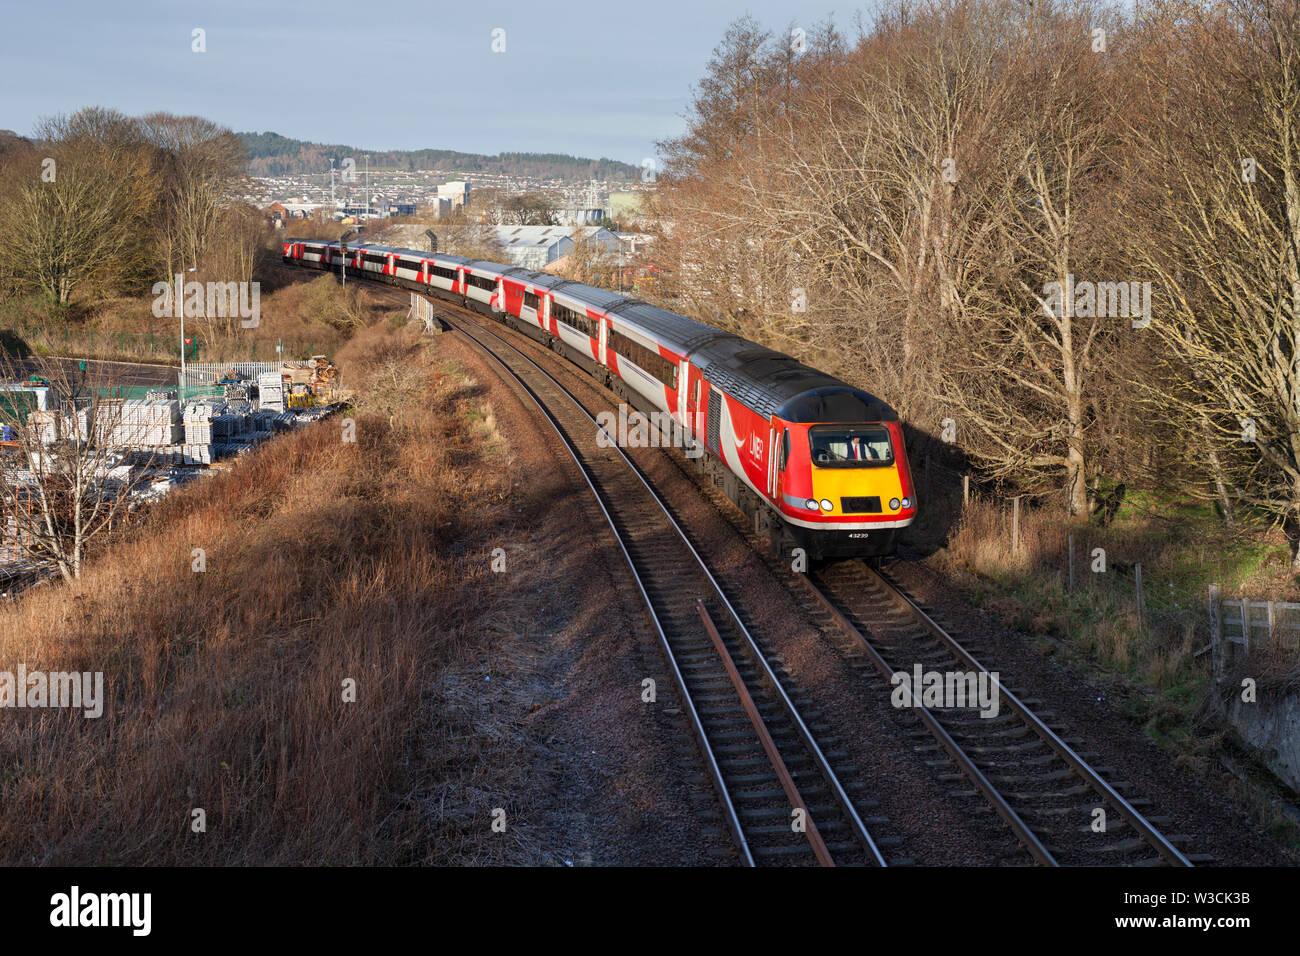 18/03/2019 Inverness Welsh's bridge Junction 43239 (+43316) 0755 Inverness - Kings cross - Stock Image